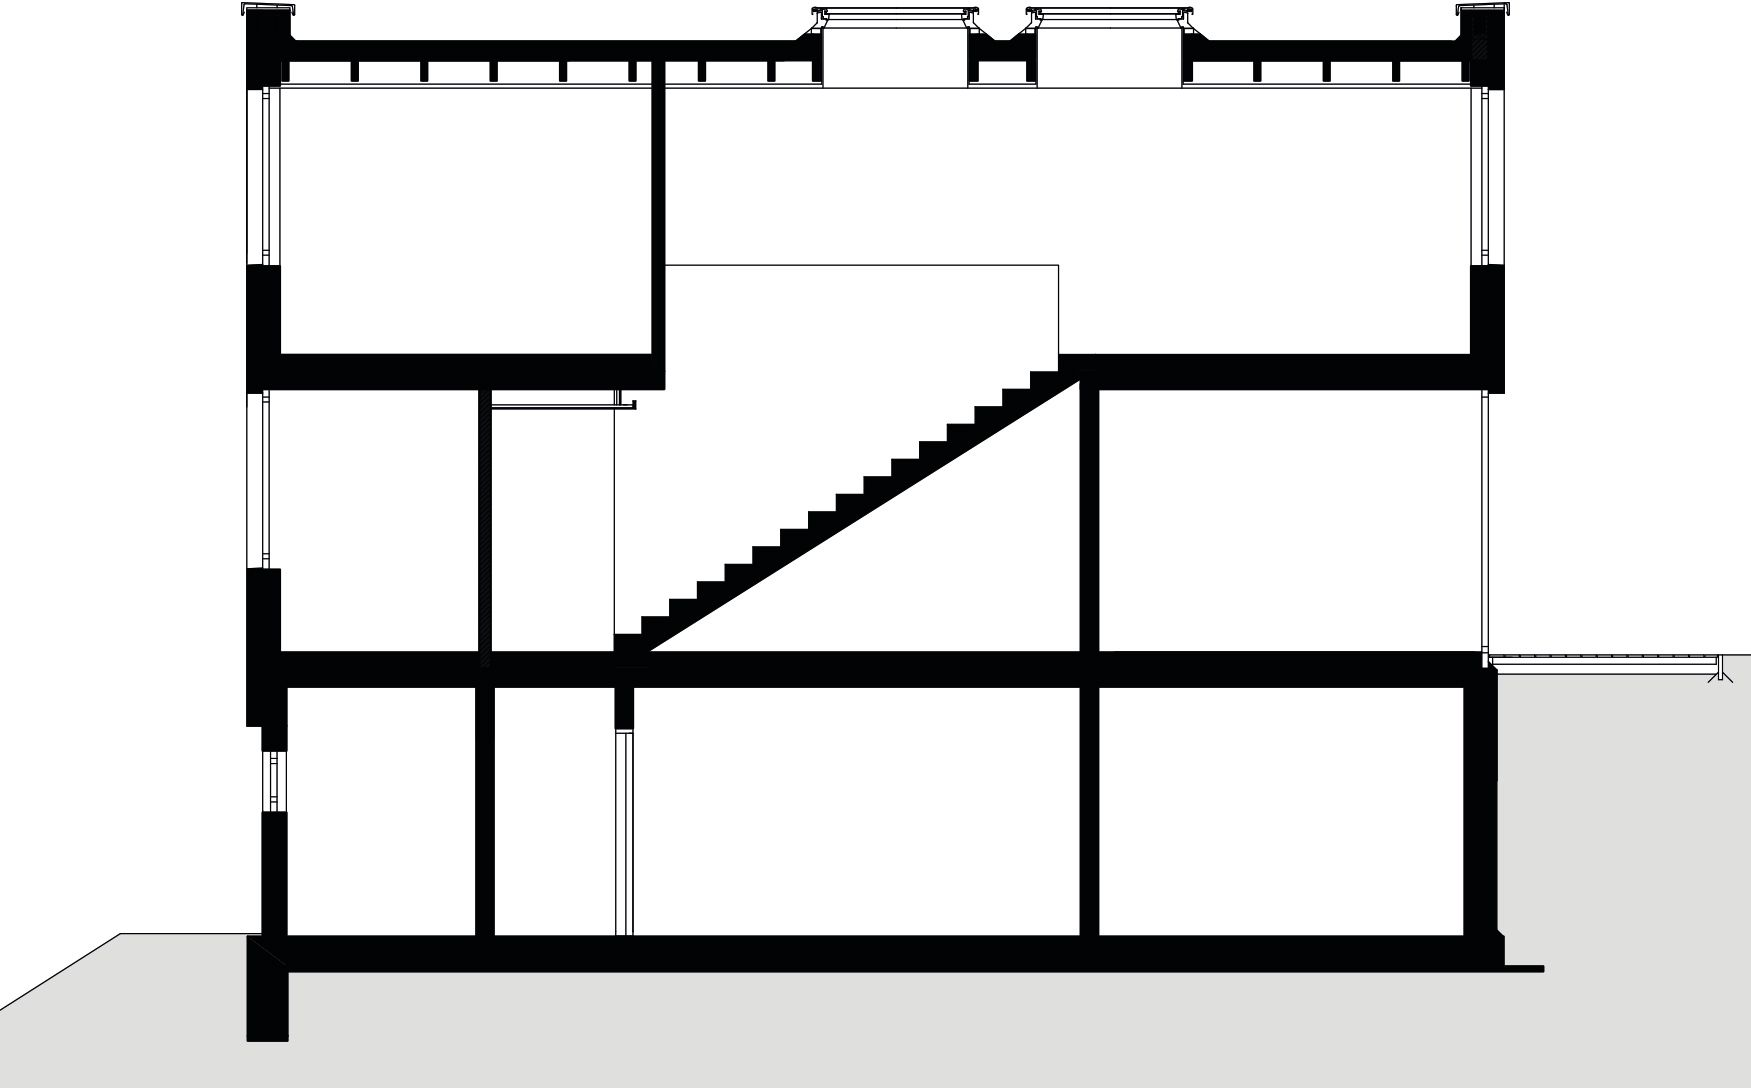 Neubau Wohngebäude h12